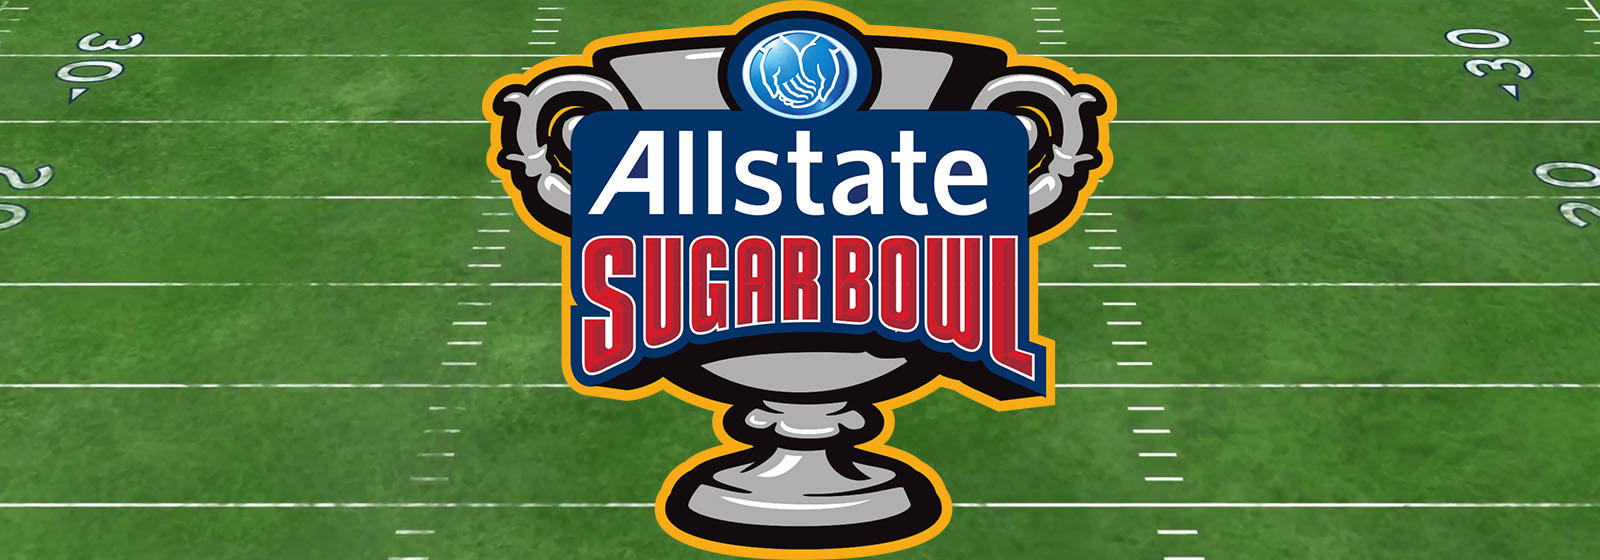 Sugar Bowl 2019